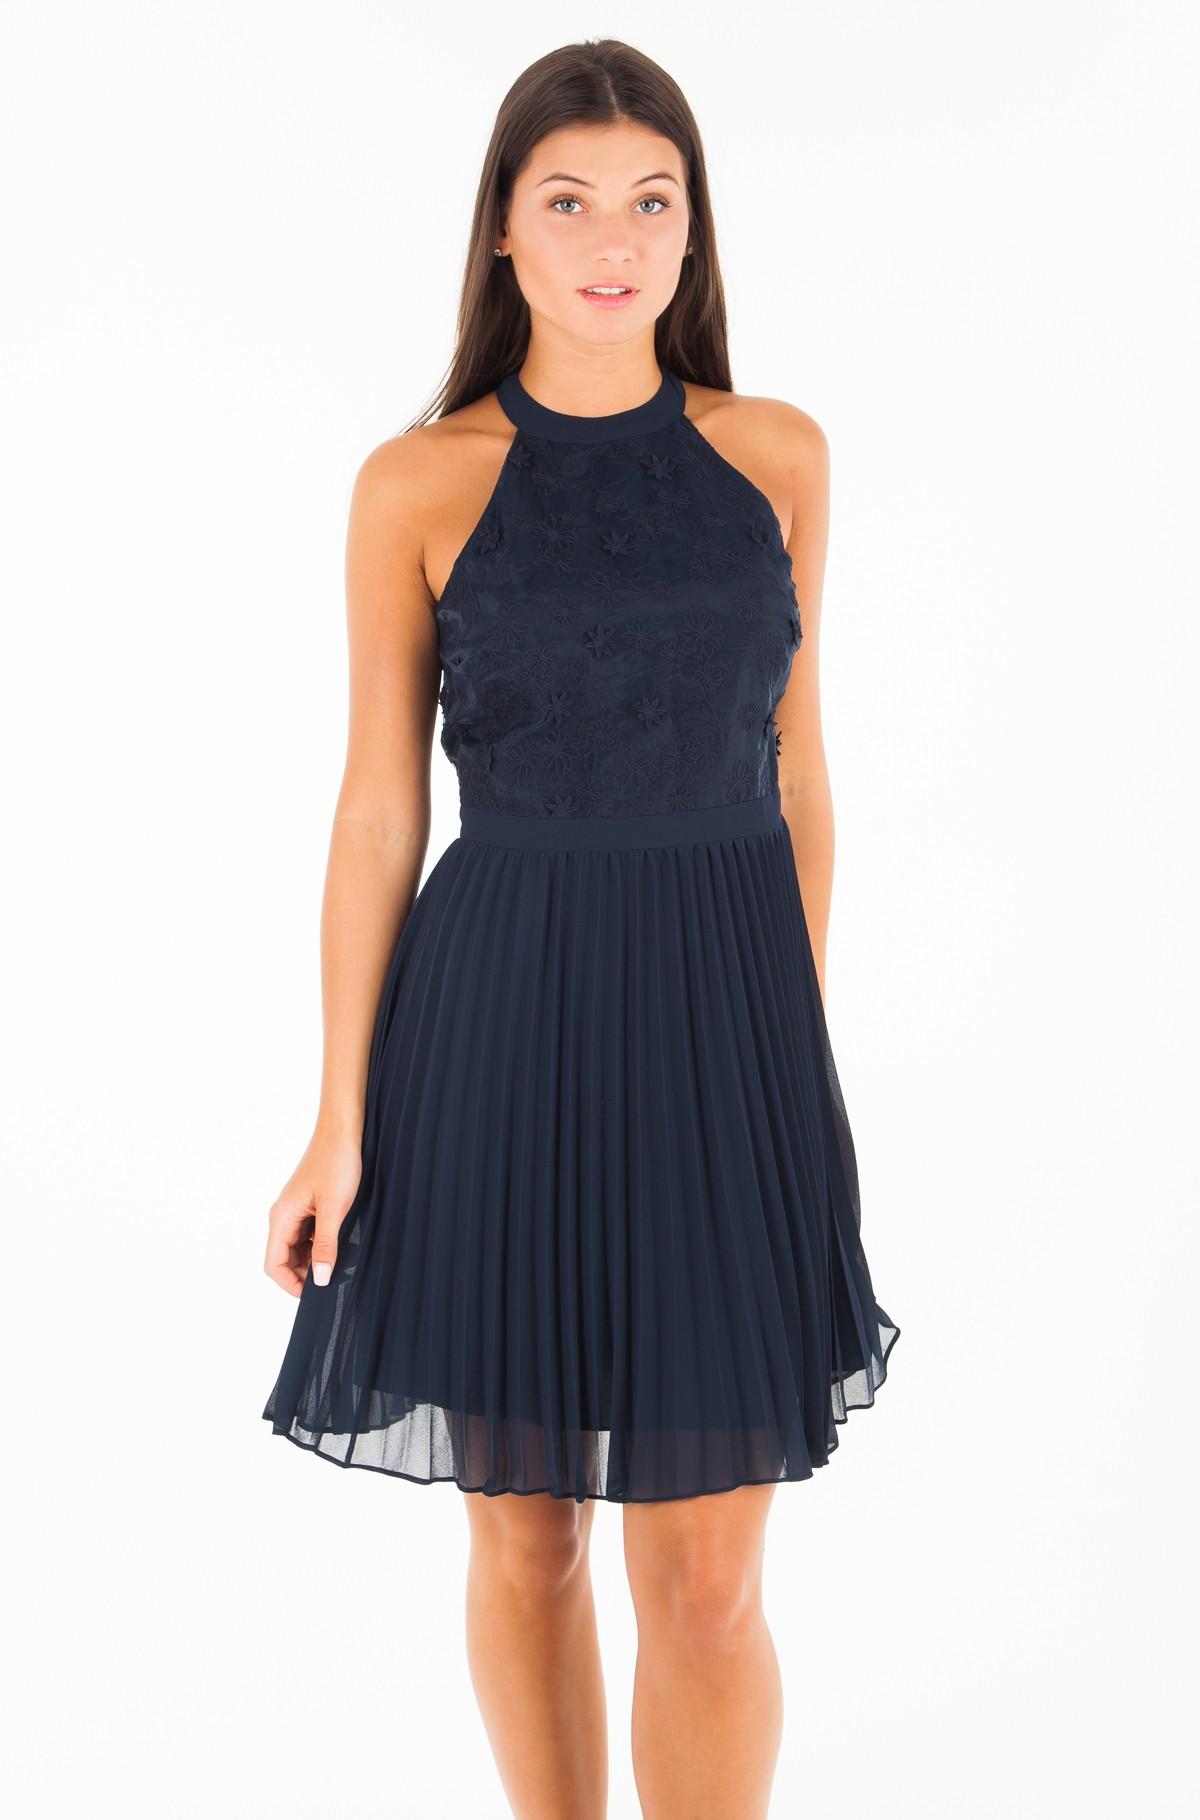 Suknelė Helfie Dress Ns-full-1